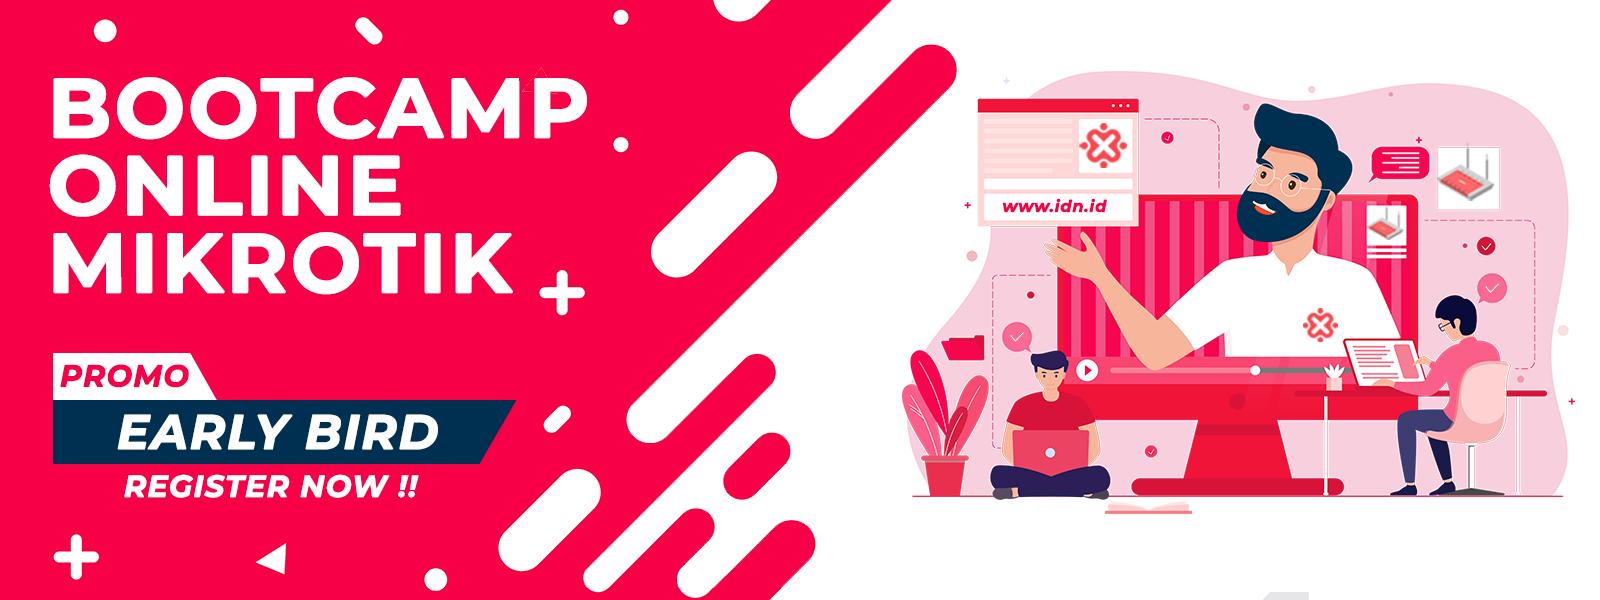 IDN Bootcamp Online Mikrotik